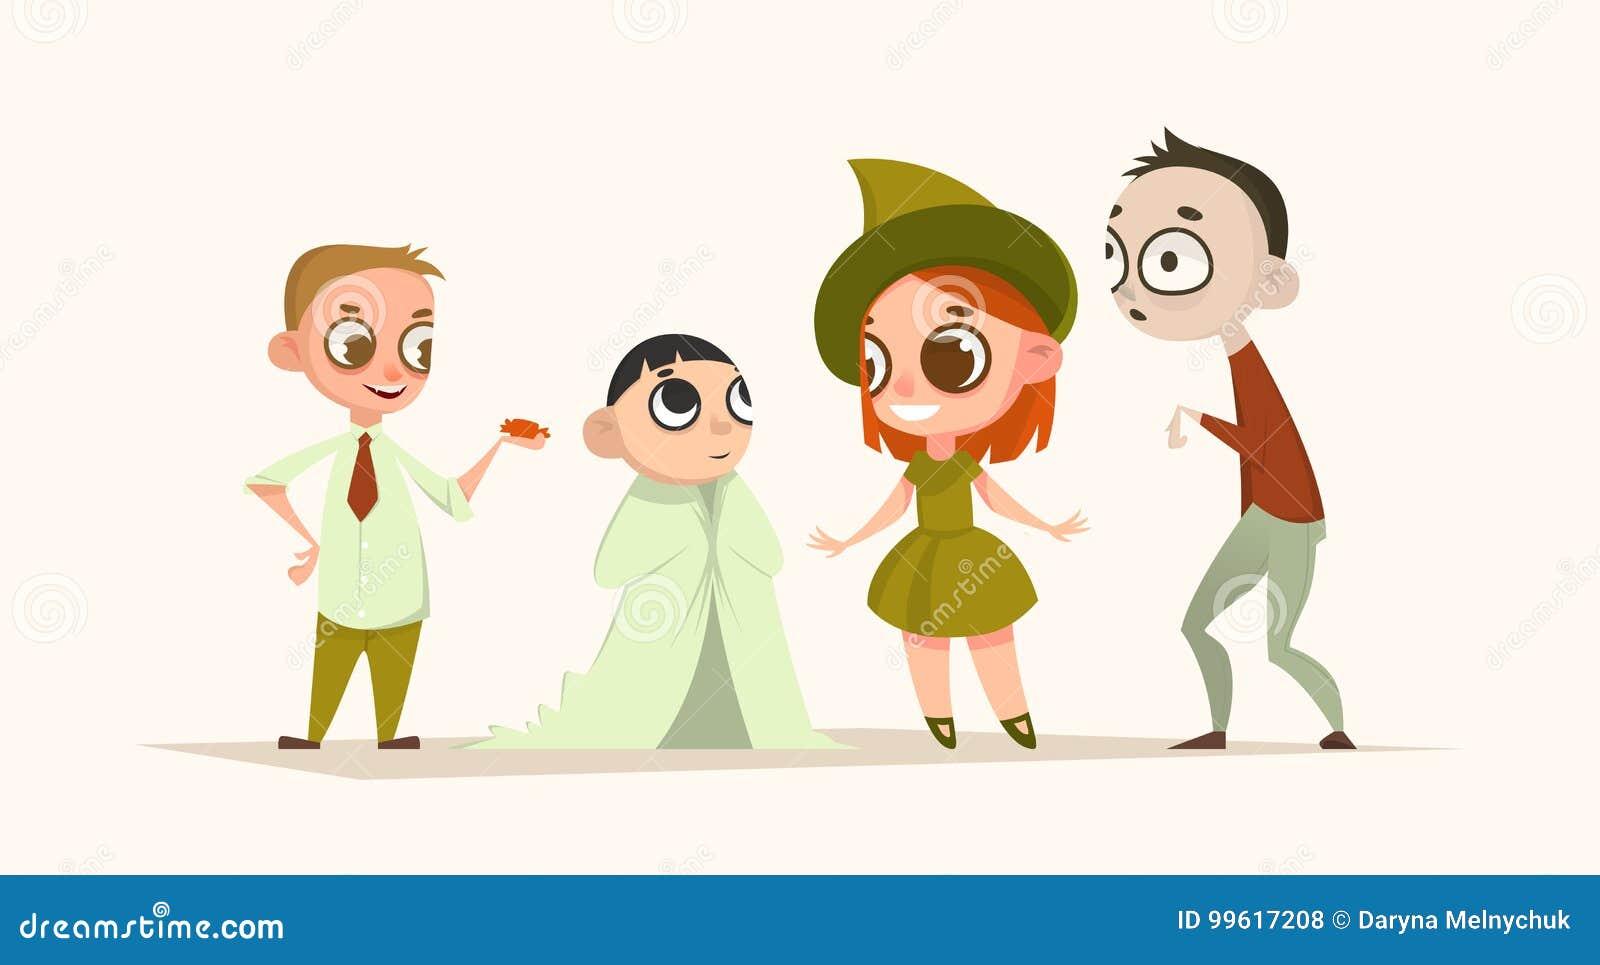 Set of cartoon characters kids. Halloween set. Vector illustration. Holiday.